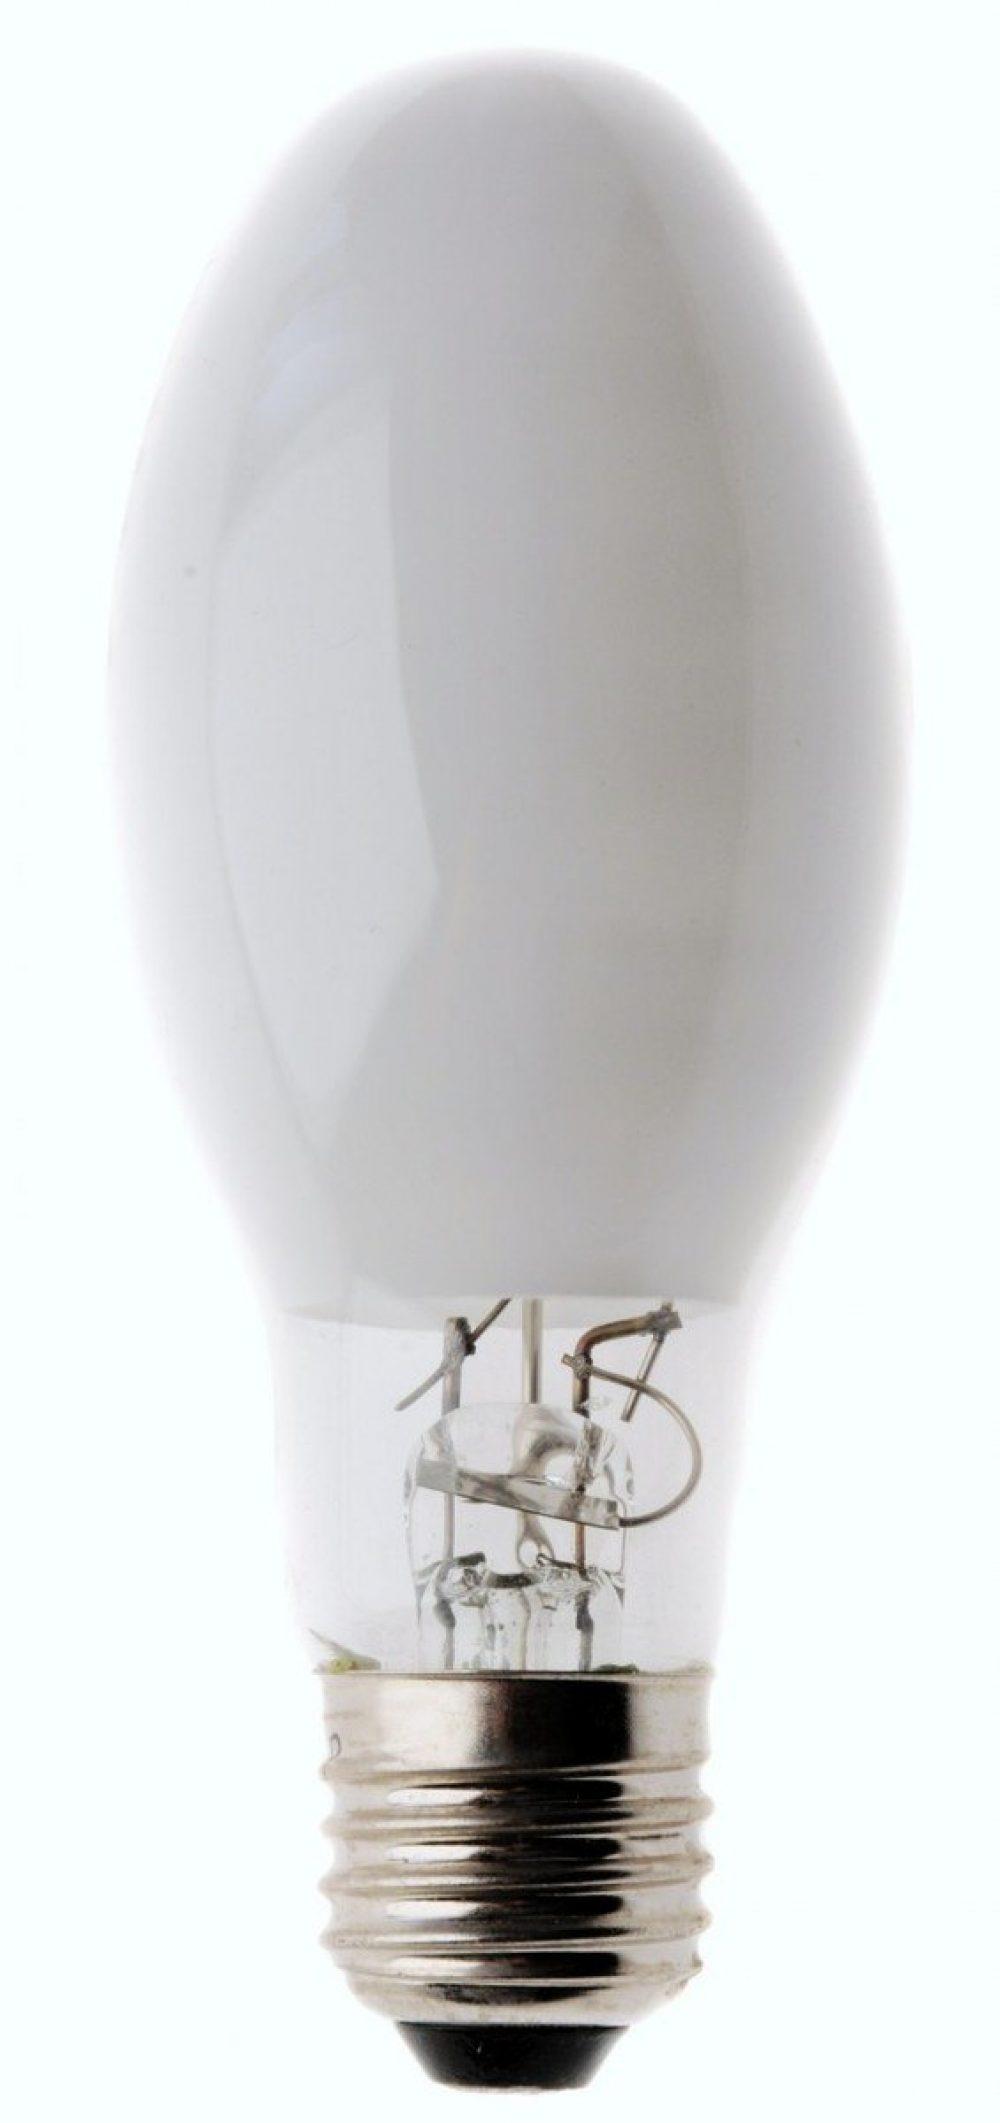 HID Metal Halide Lamps MP150W/ EDX54/ C/ U/ 3K/ E27/ COATED/ EUROPE